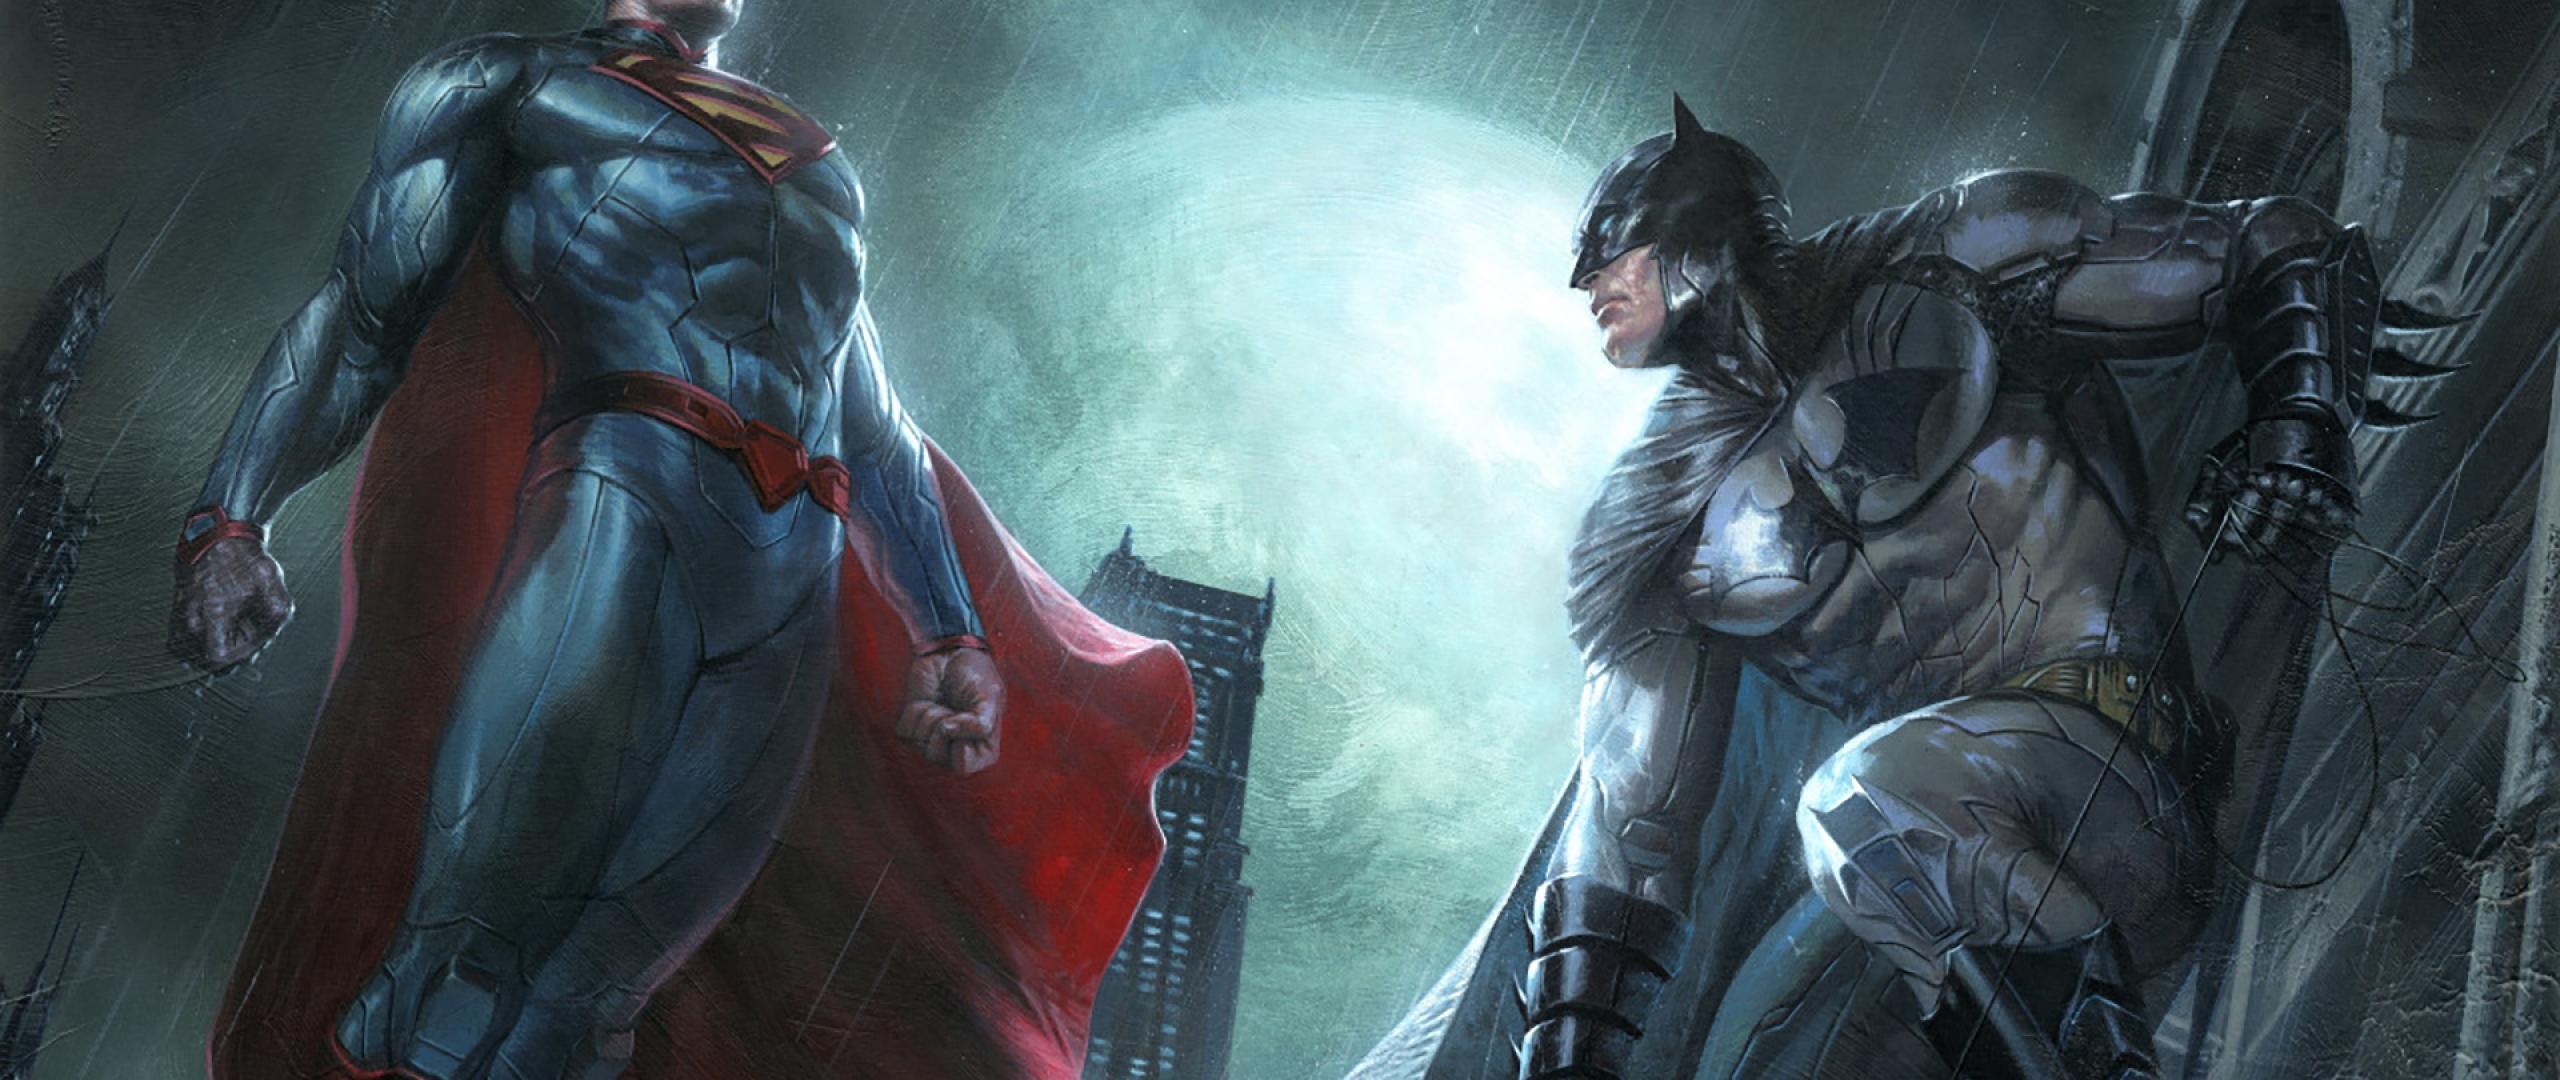 superman and batman dc comics superheroes artwork  full hd